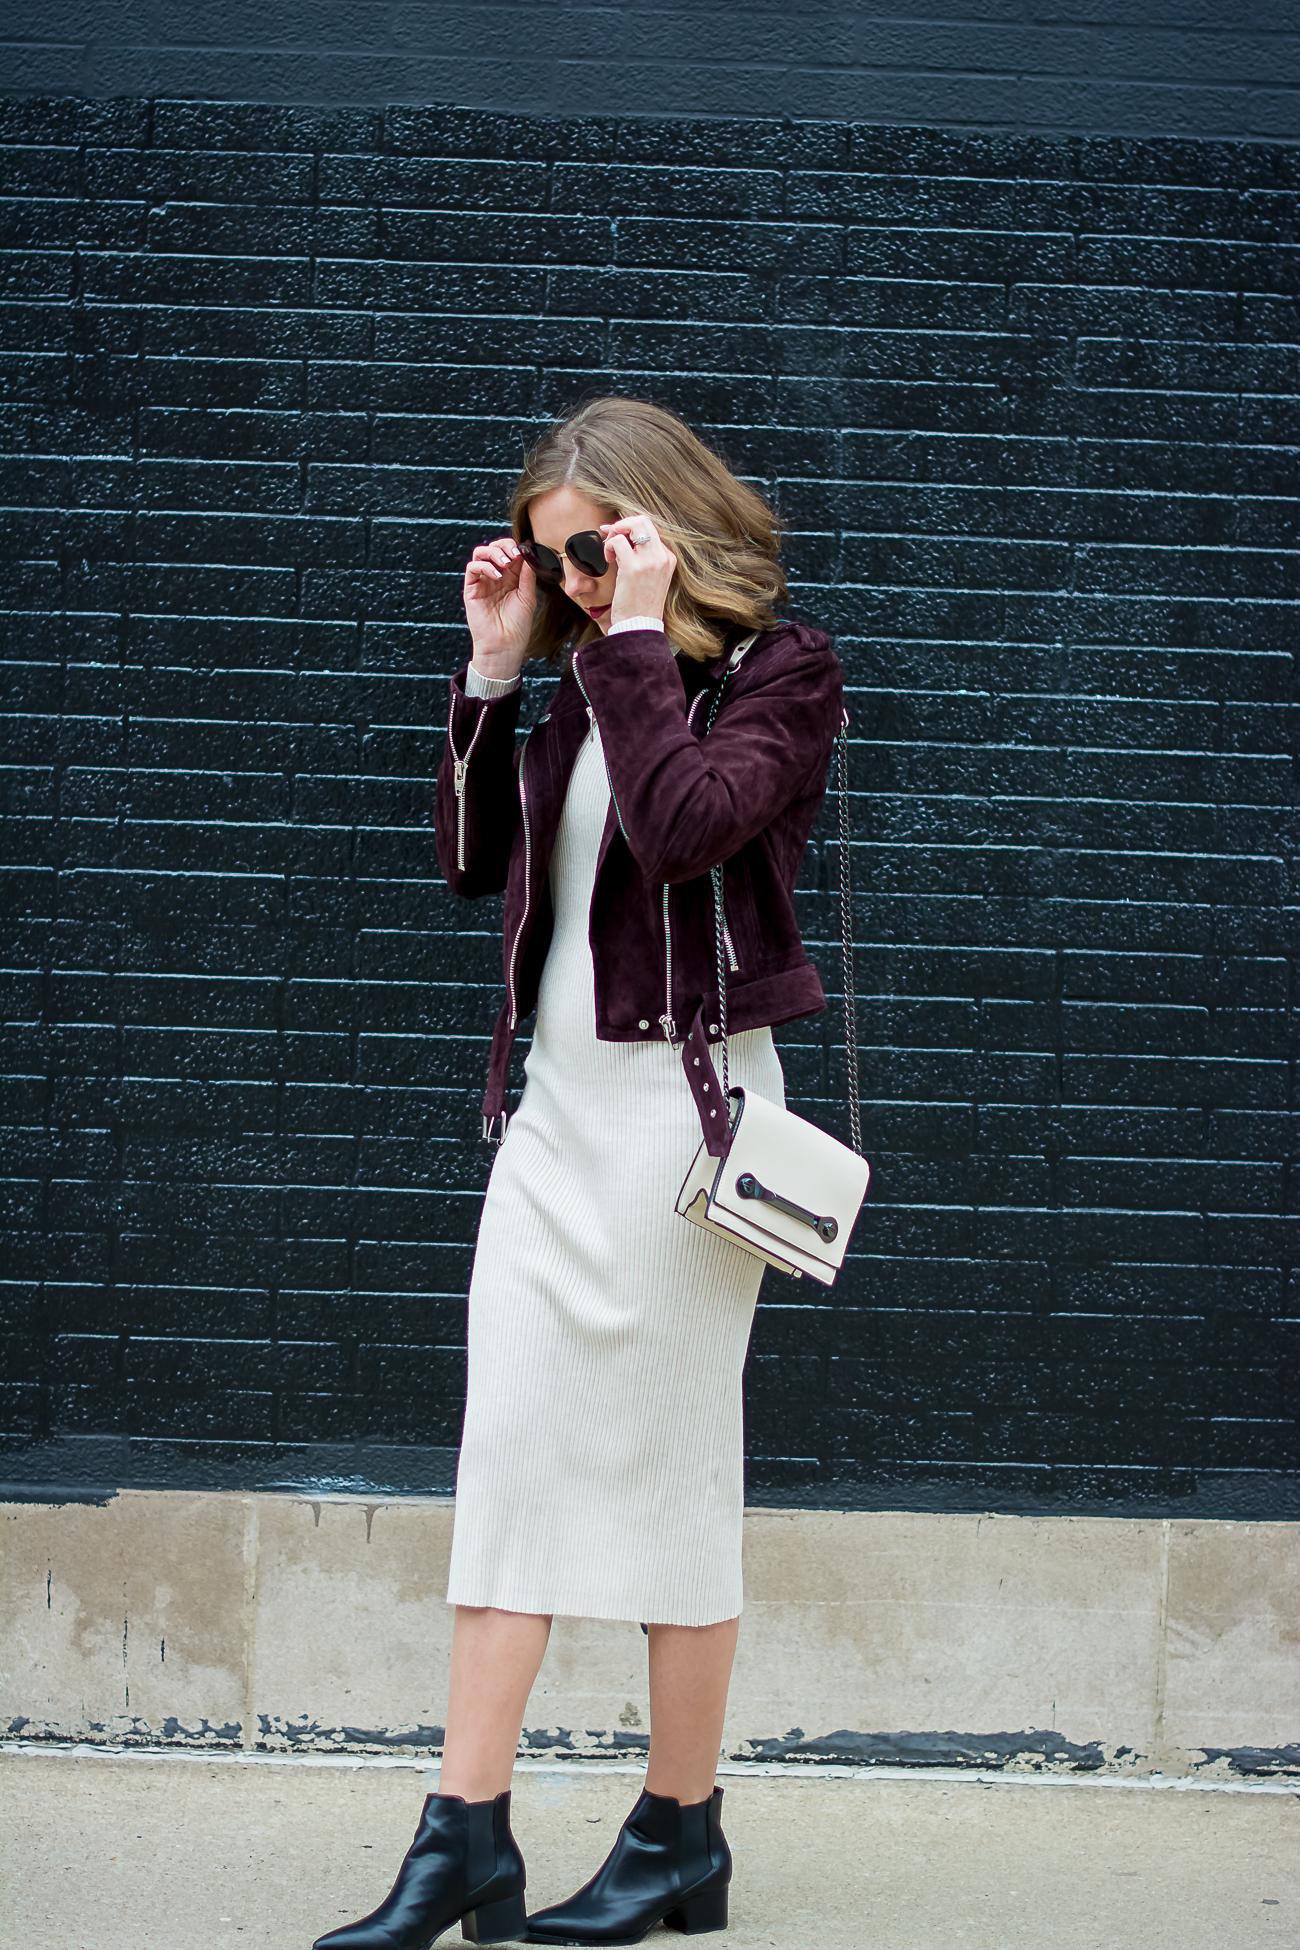 zara-rib-knit-bodycon-midi-dress-blank-nyc-burgundy-suede-moto-jacket-forever-21-cream-crossbody-black-pointed-justfab-ankle-boots